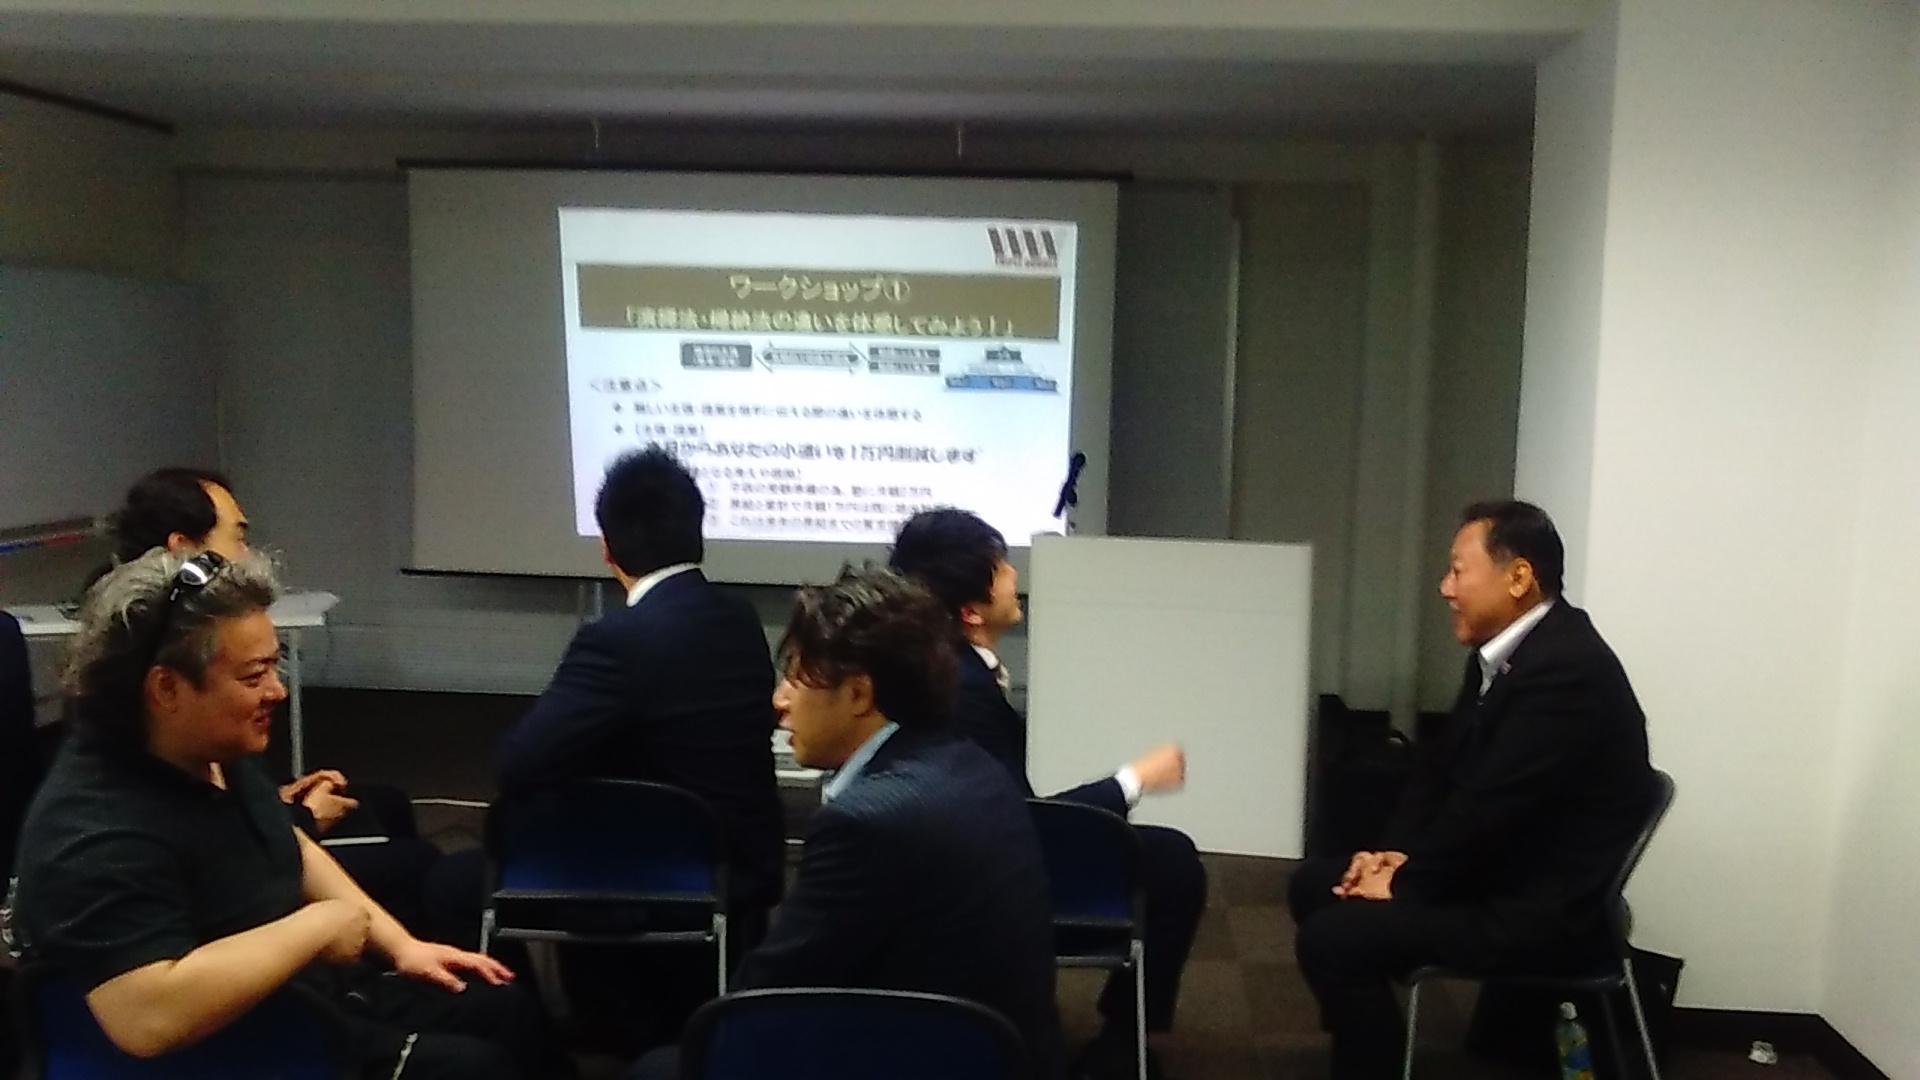 KIMG0738 - 猛獣塾入門講座開催しました。